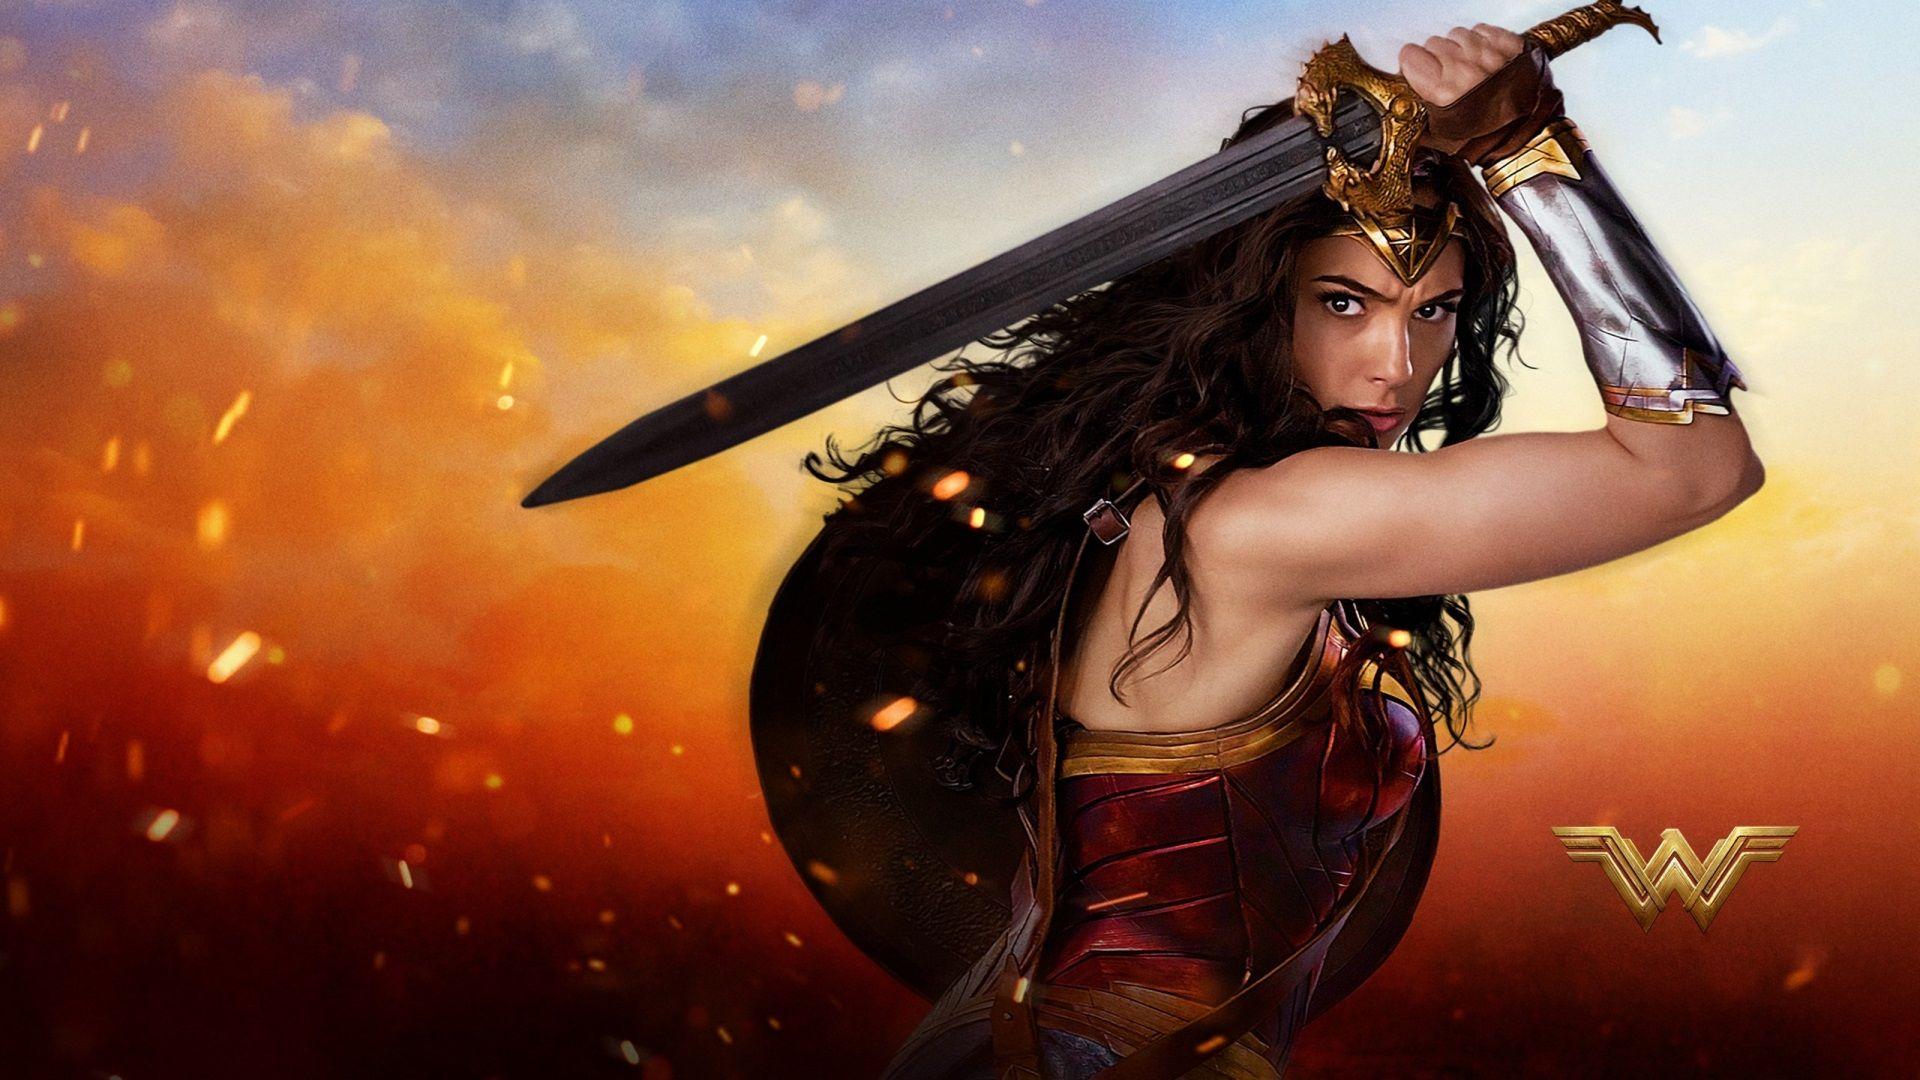 1920x1080 Wonder Woman Wallpaper Hd Pc Download In 2020 Wonder Woman Wonder Woman Movie Gal Gadot